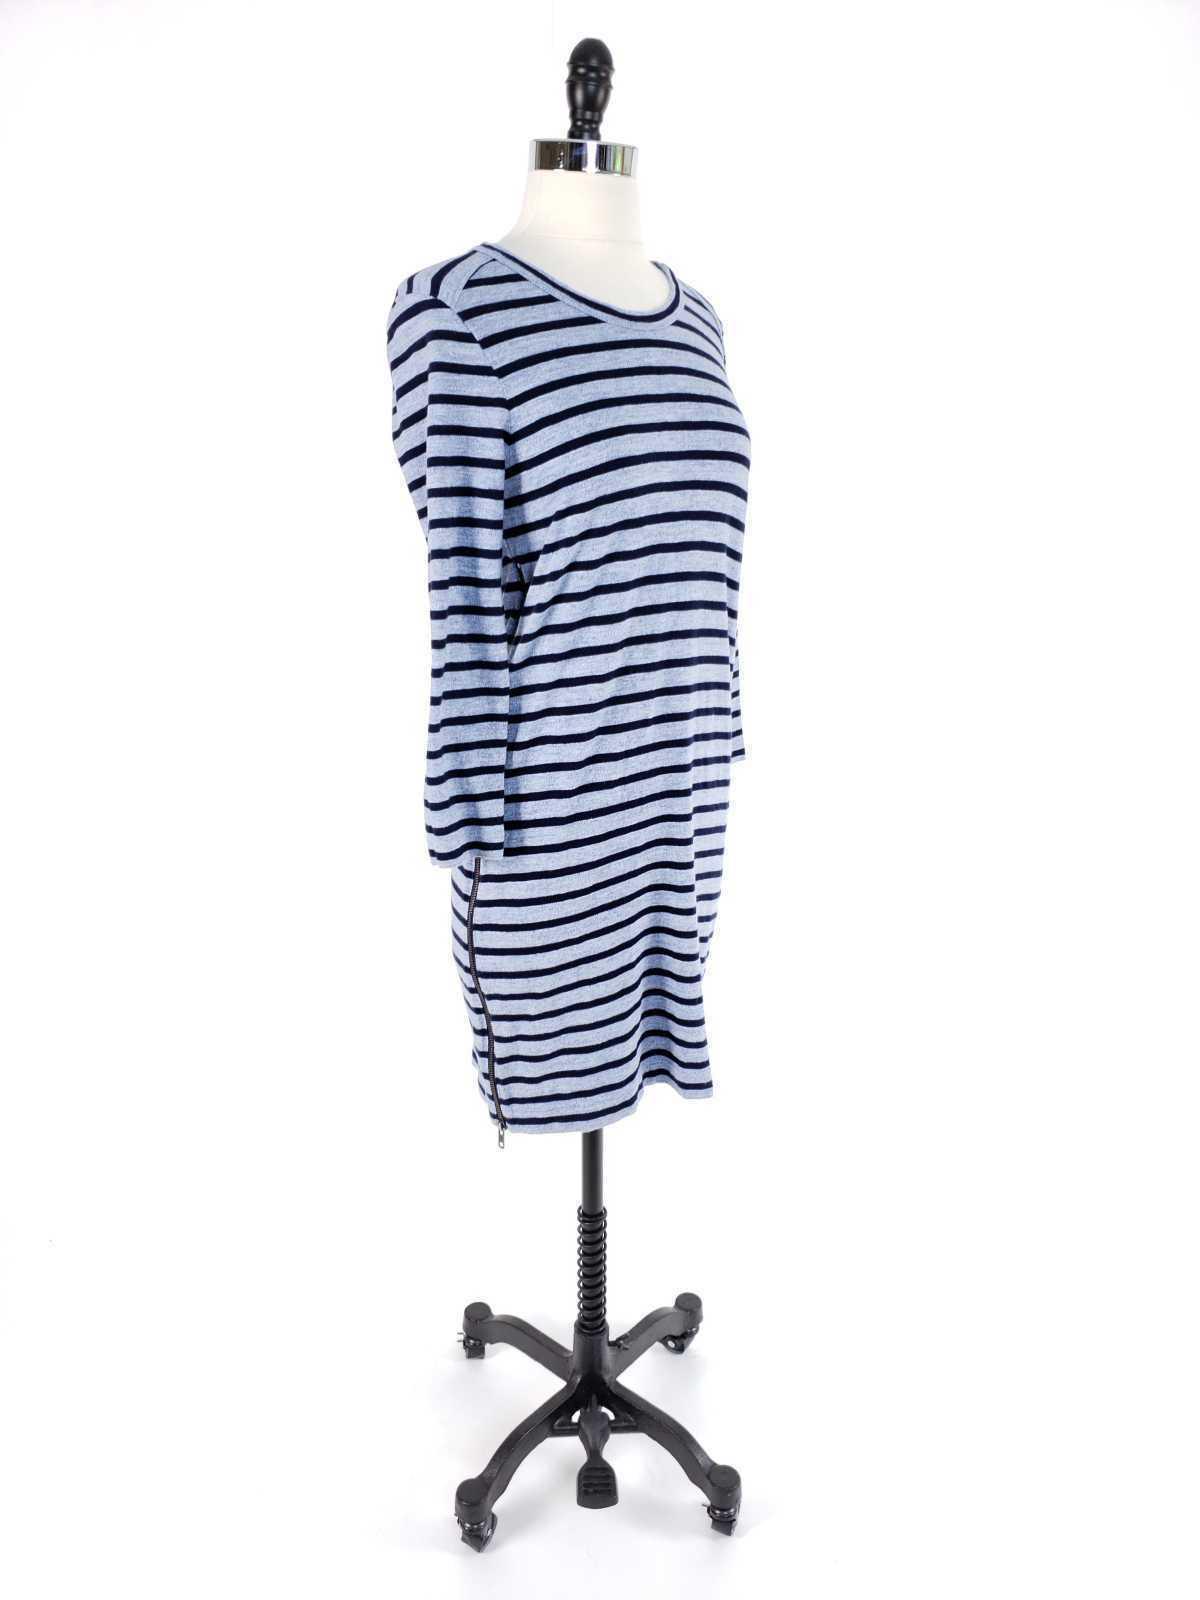 J.Crew Women XS Dress Striped Side Zip Tshirt Cotton Long Sleeve Casual image 3